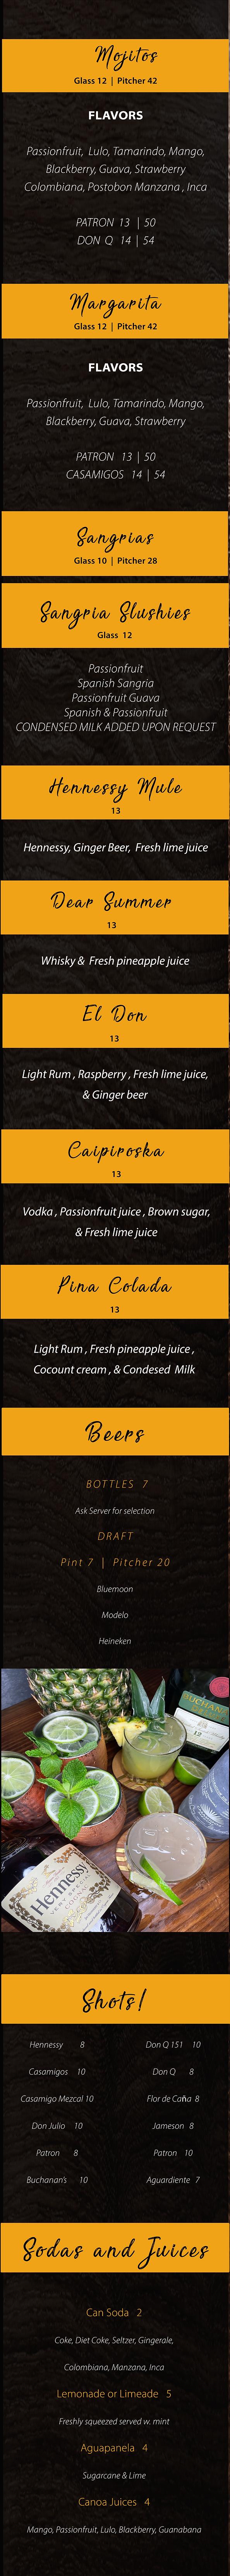 1st cocktail mobile Menu.png